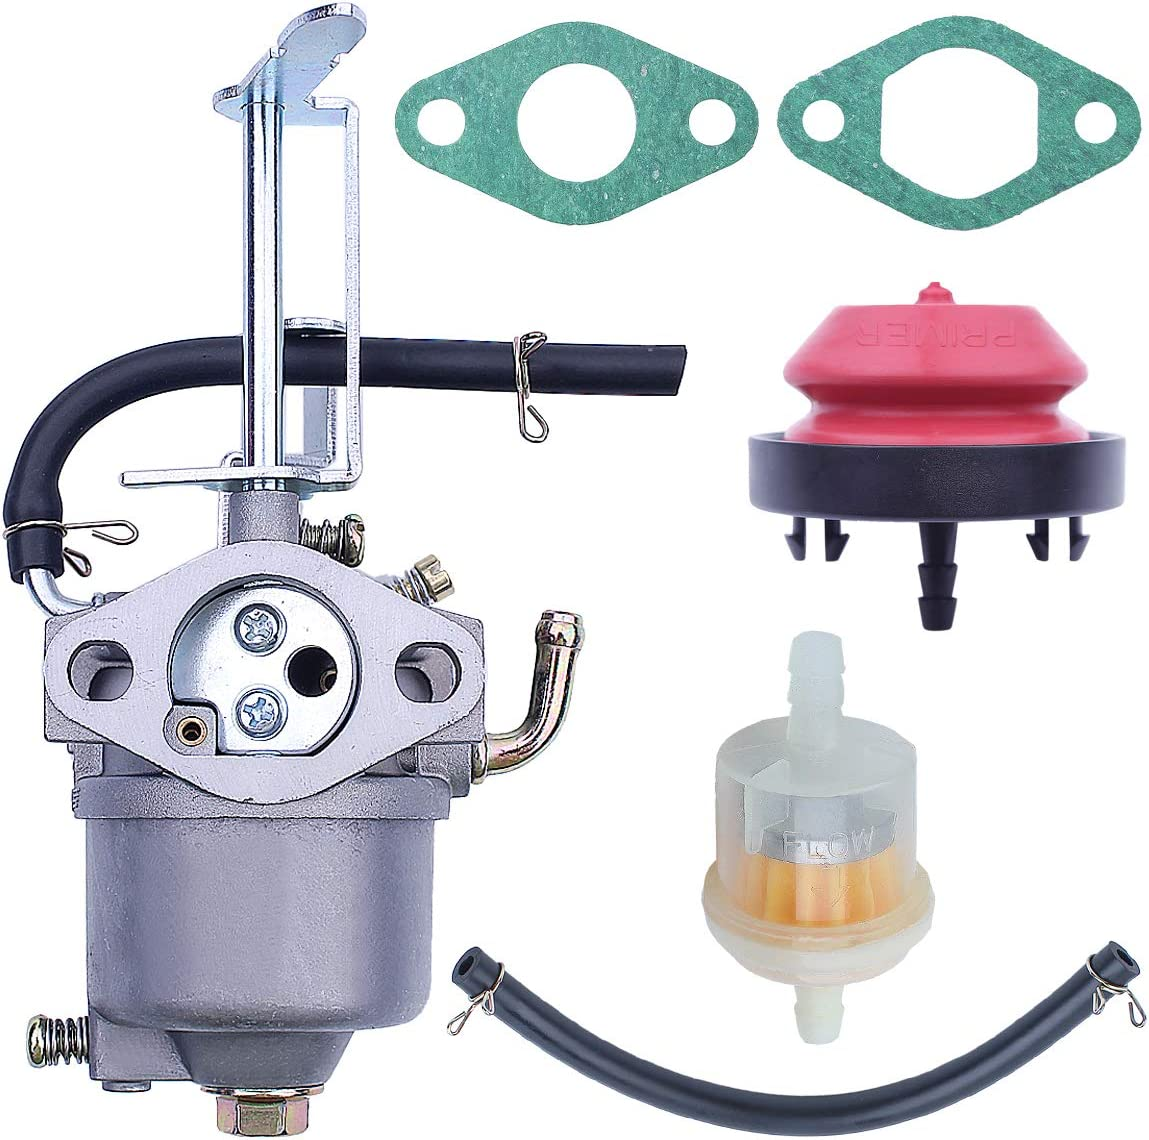 Adefol 418ZR Snow Sales Blower Carburetor Fuel Line Parts S for Clearance SALE! Limited time! Filter